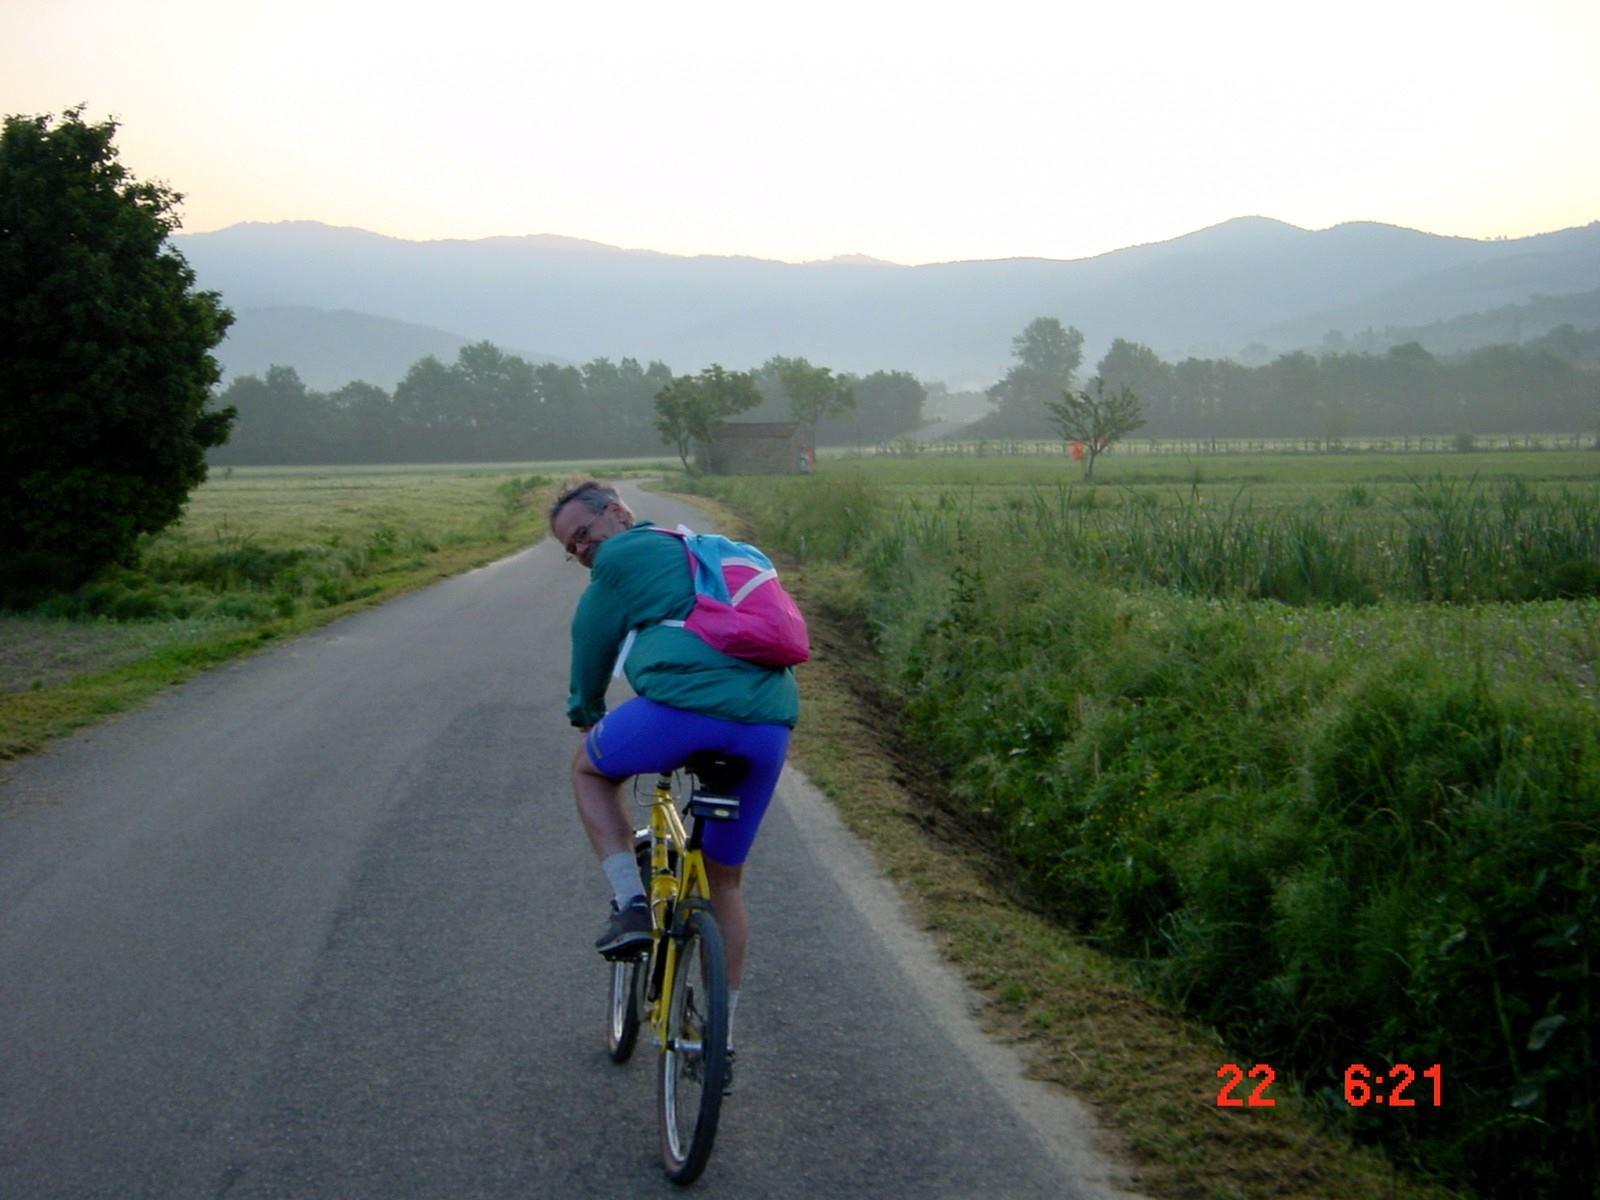 Foto: Manfred Karl / Mountainbike Tour / Monte Castel Giudeo, 1037 m / Kurz nach dem Start / 20.06.2007 06:31:13